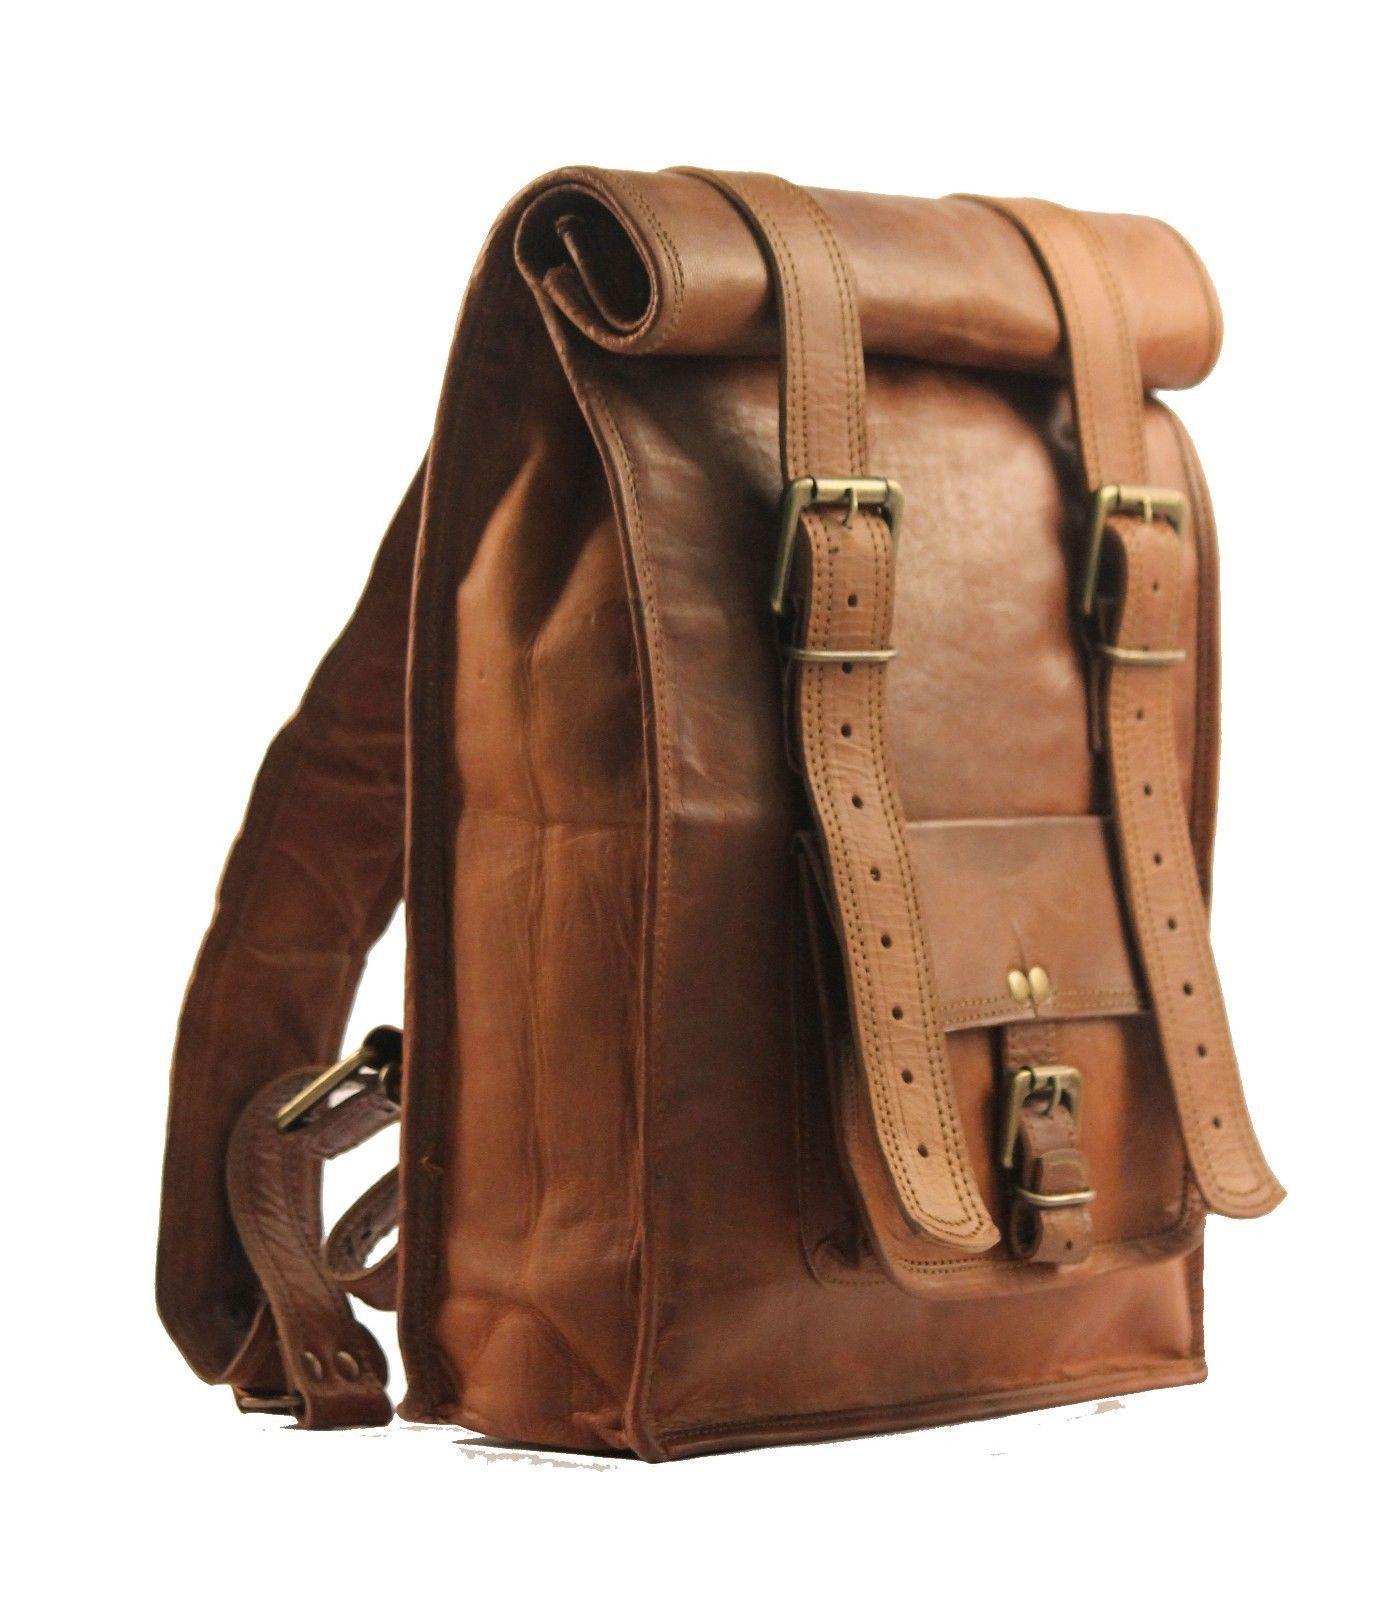 New Man's Office Rustic Vintage Soft Leather Messenger Laptop (11x15) Sale Bags